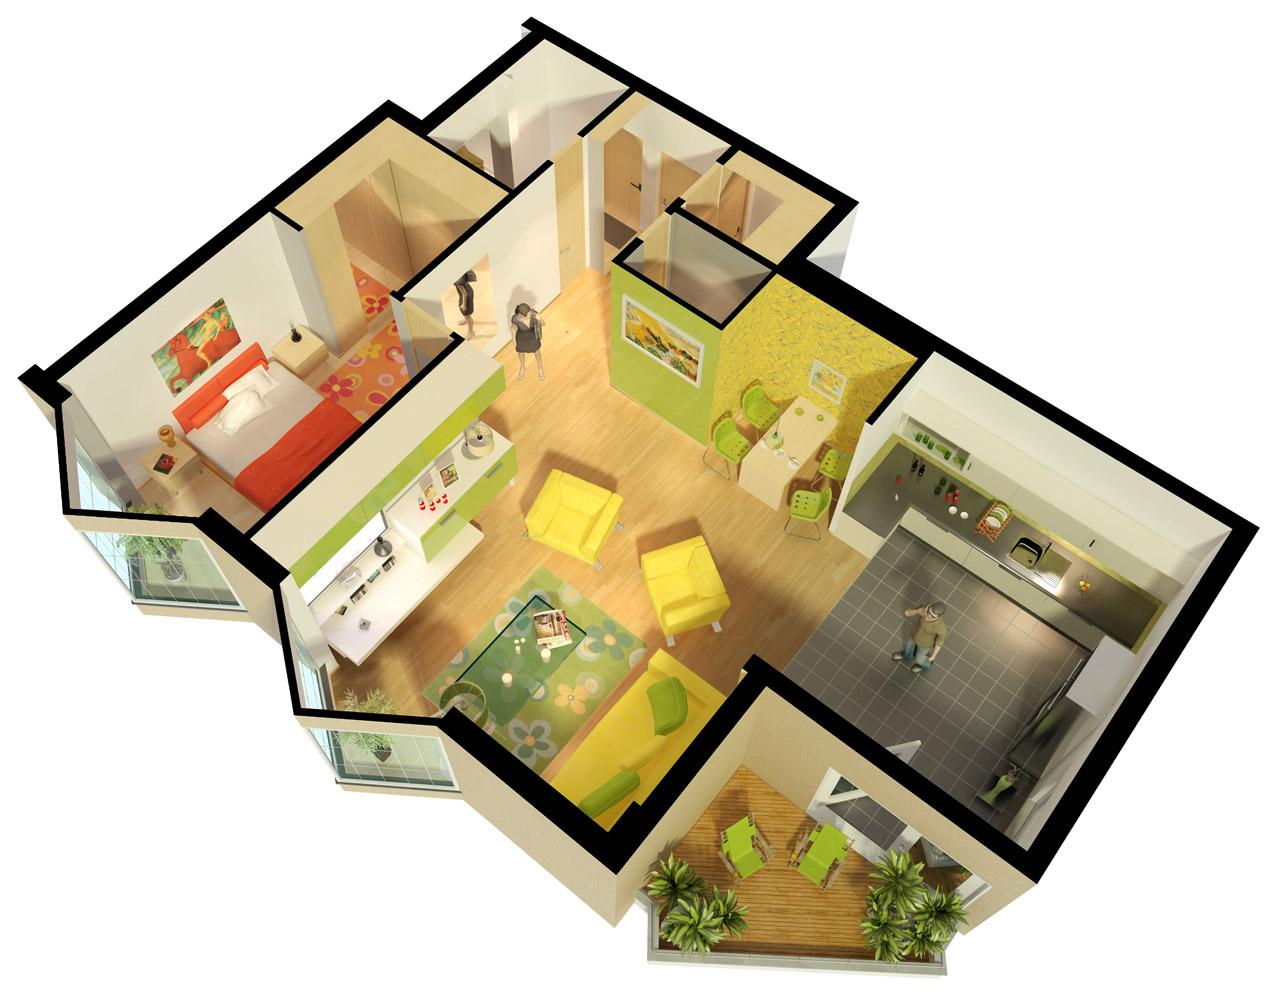 3d exterieur 3d interieur 3d plattegrond 3d maquette 3d for 2d plattegrond maken